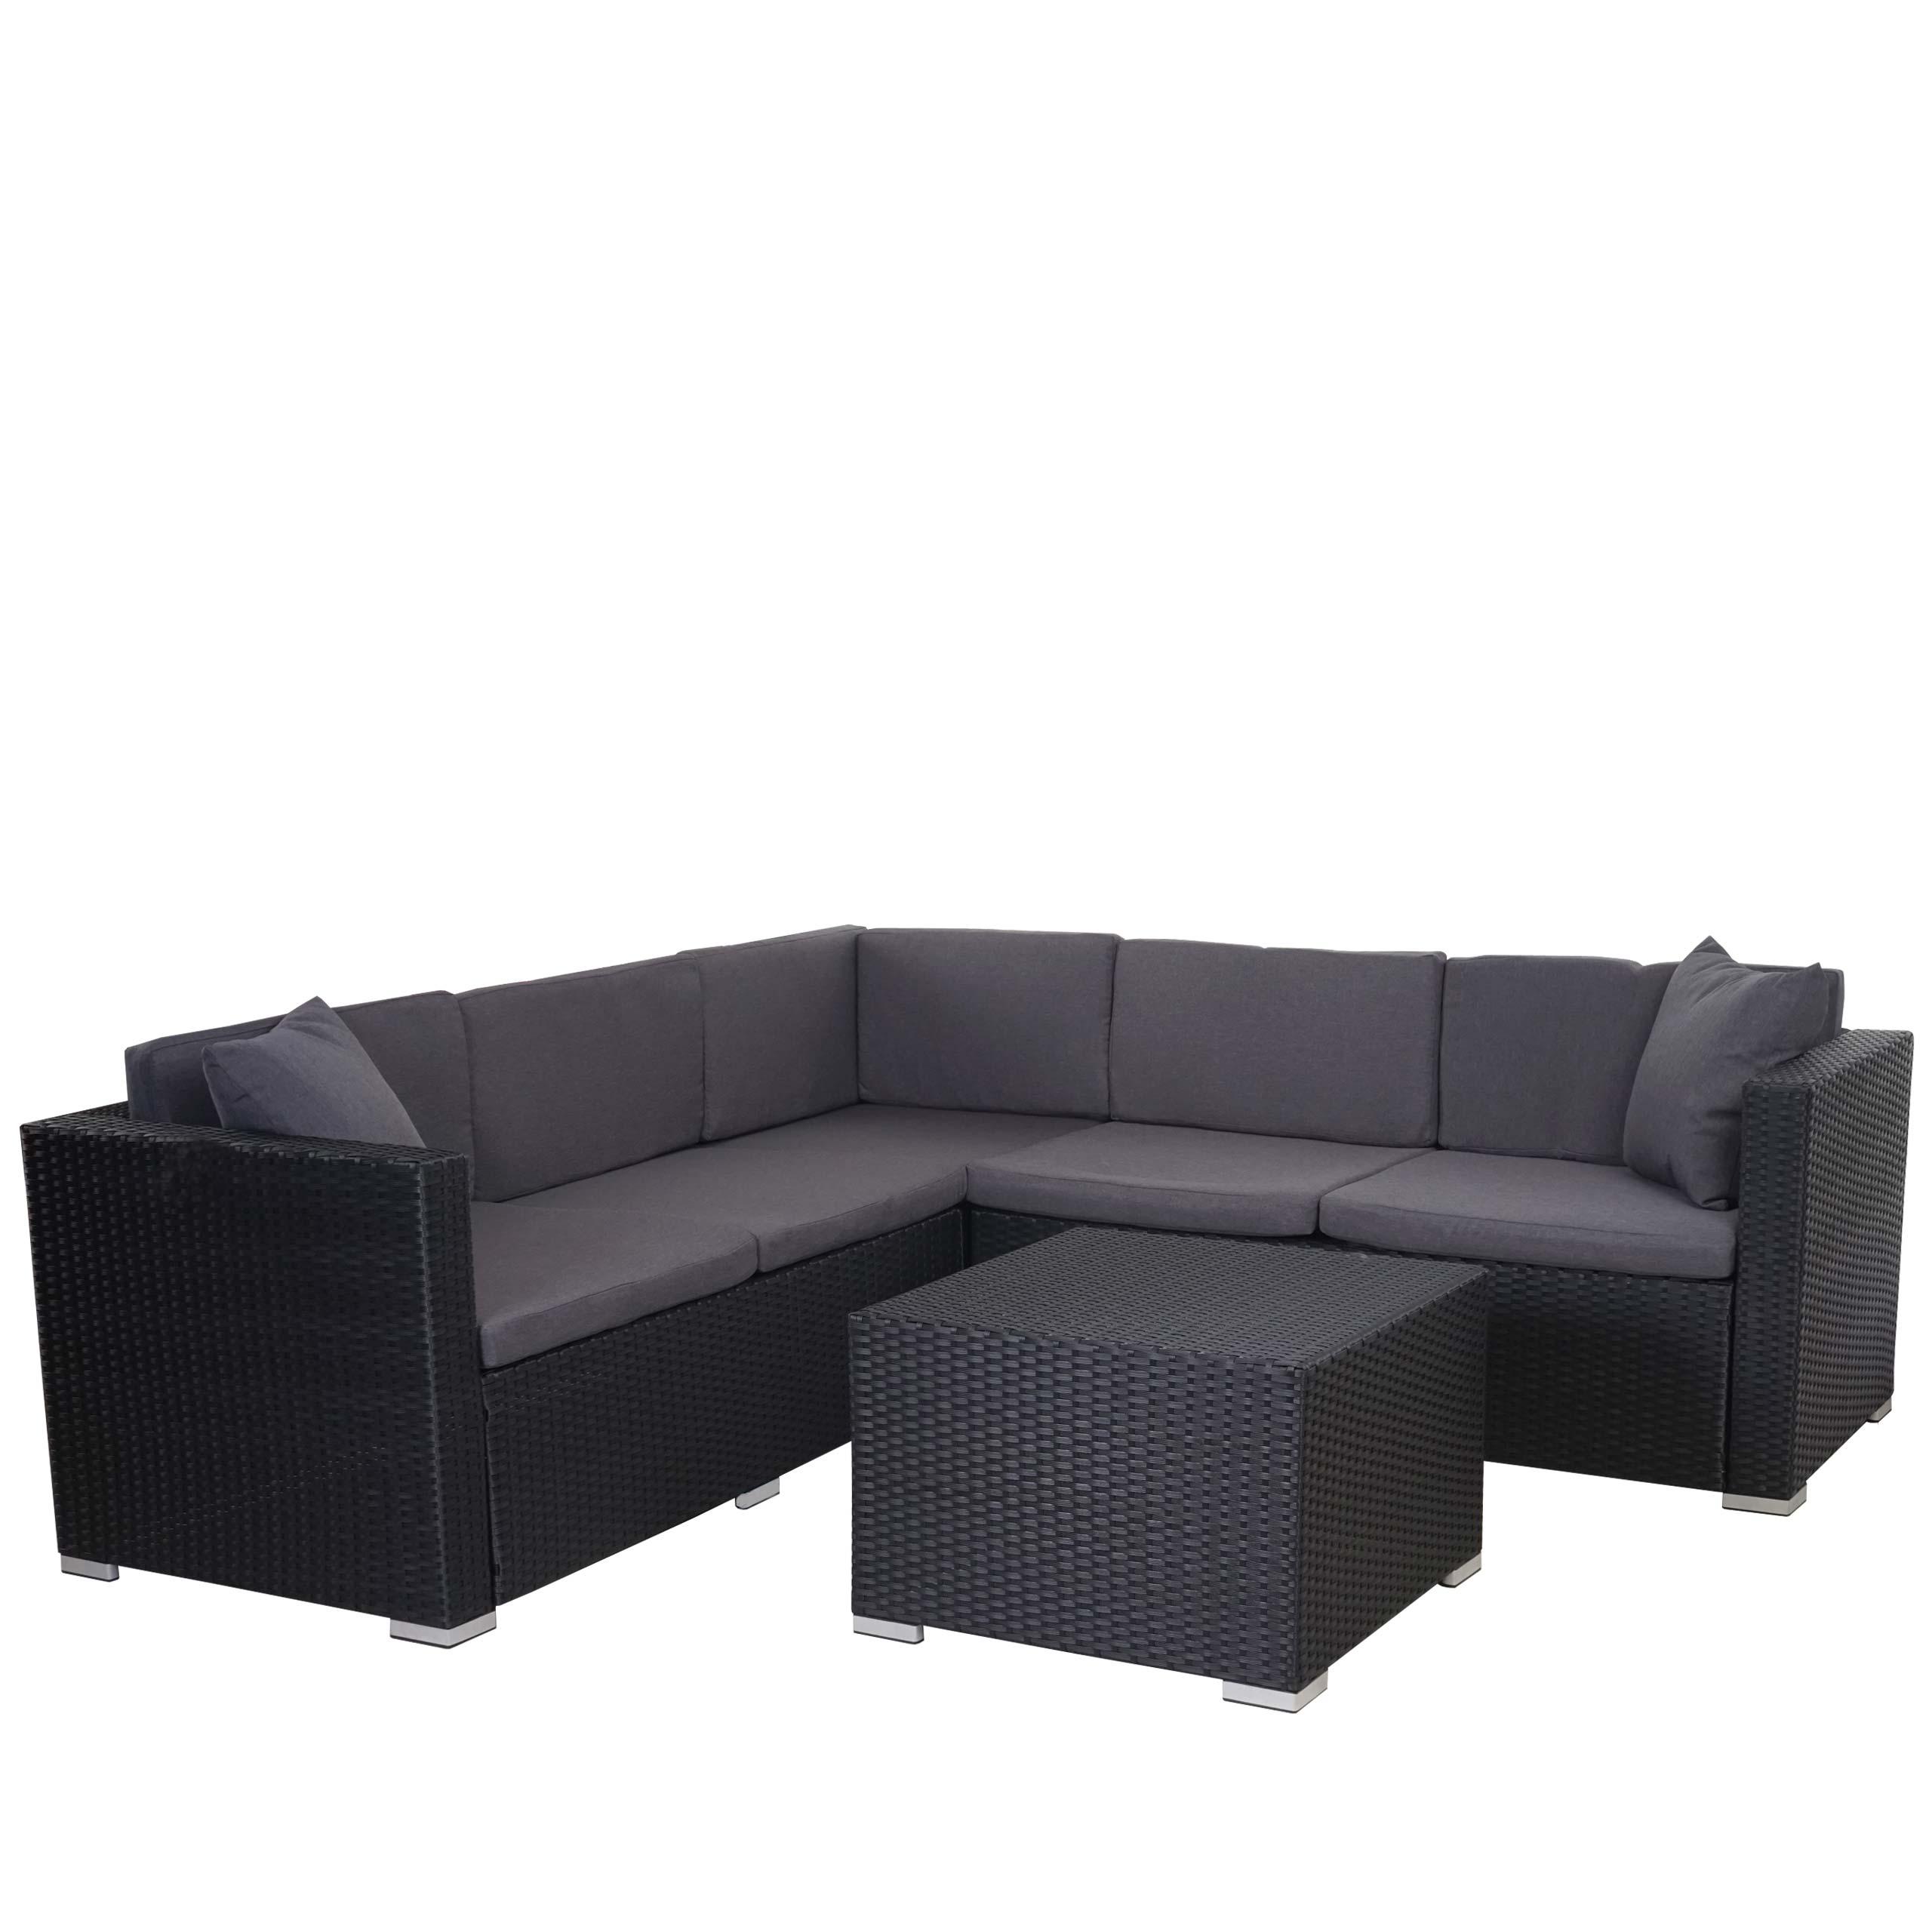 Full Size of Rattan Indoor Sofa Set Outdoor Uk For Sale Furniture Table Cover India Bed 58b8be87800b7 Barock Benz Lagerverkauf Freistil Big Xxl Chesterfield Grau Led 3er Sofa Rattan Sofa